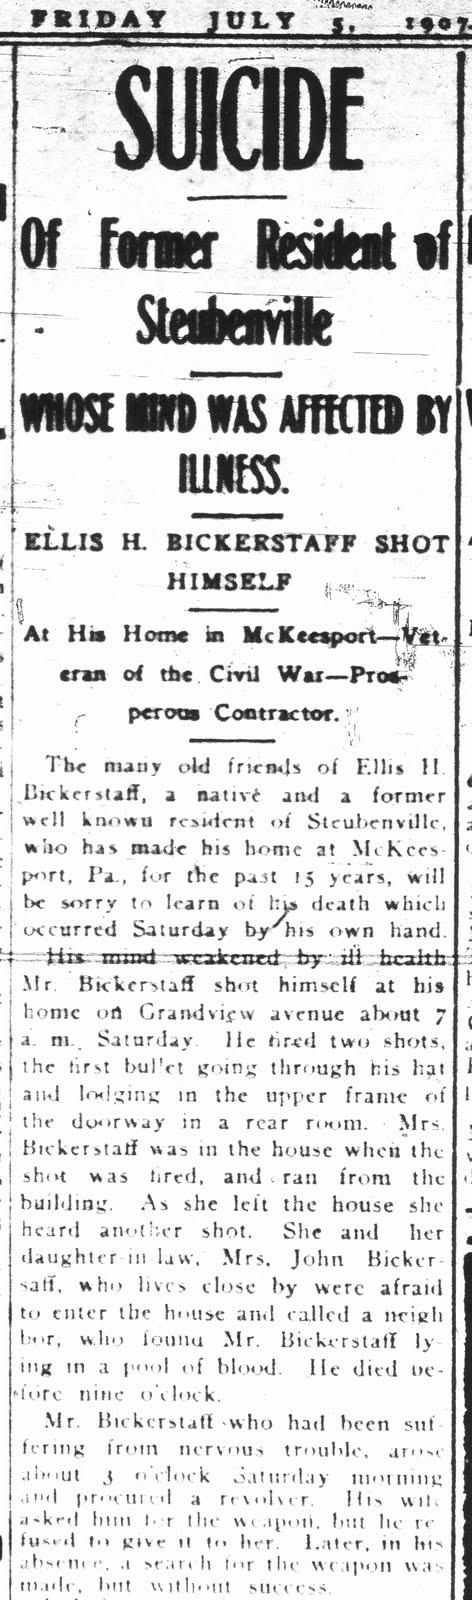 My Ancestors and Me: Ellis Bickerstaff - Life and Death